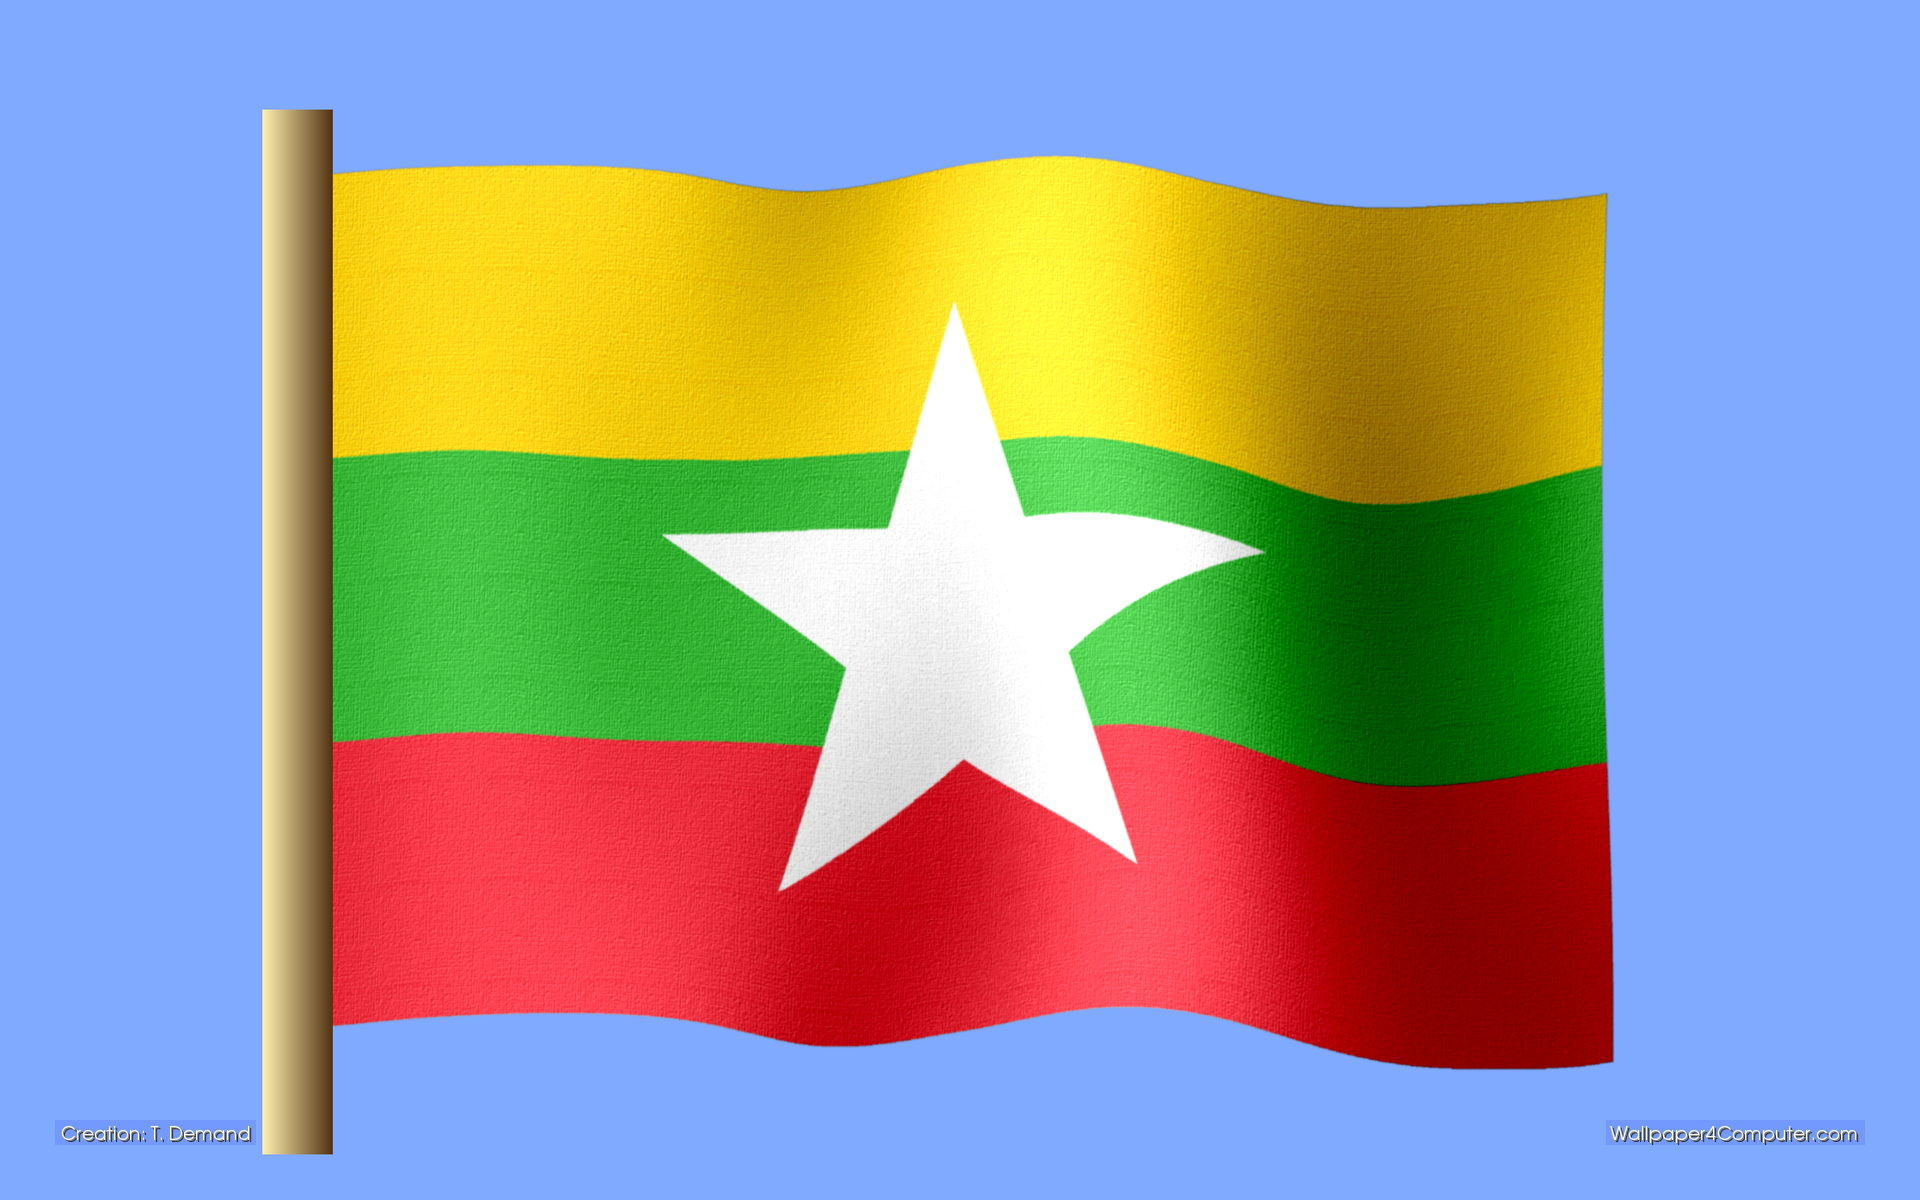 Wallpaper for Computer – Burmese flag desktop wallpaper – 1920 x 1200 pixels